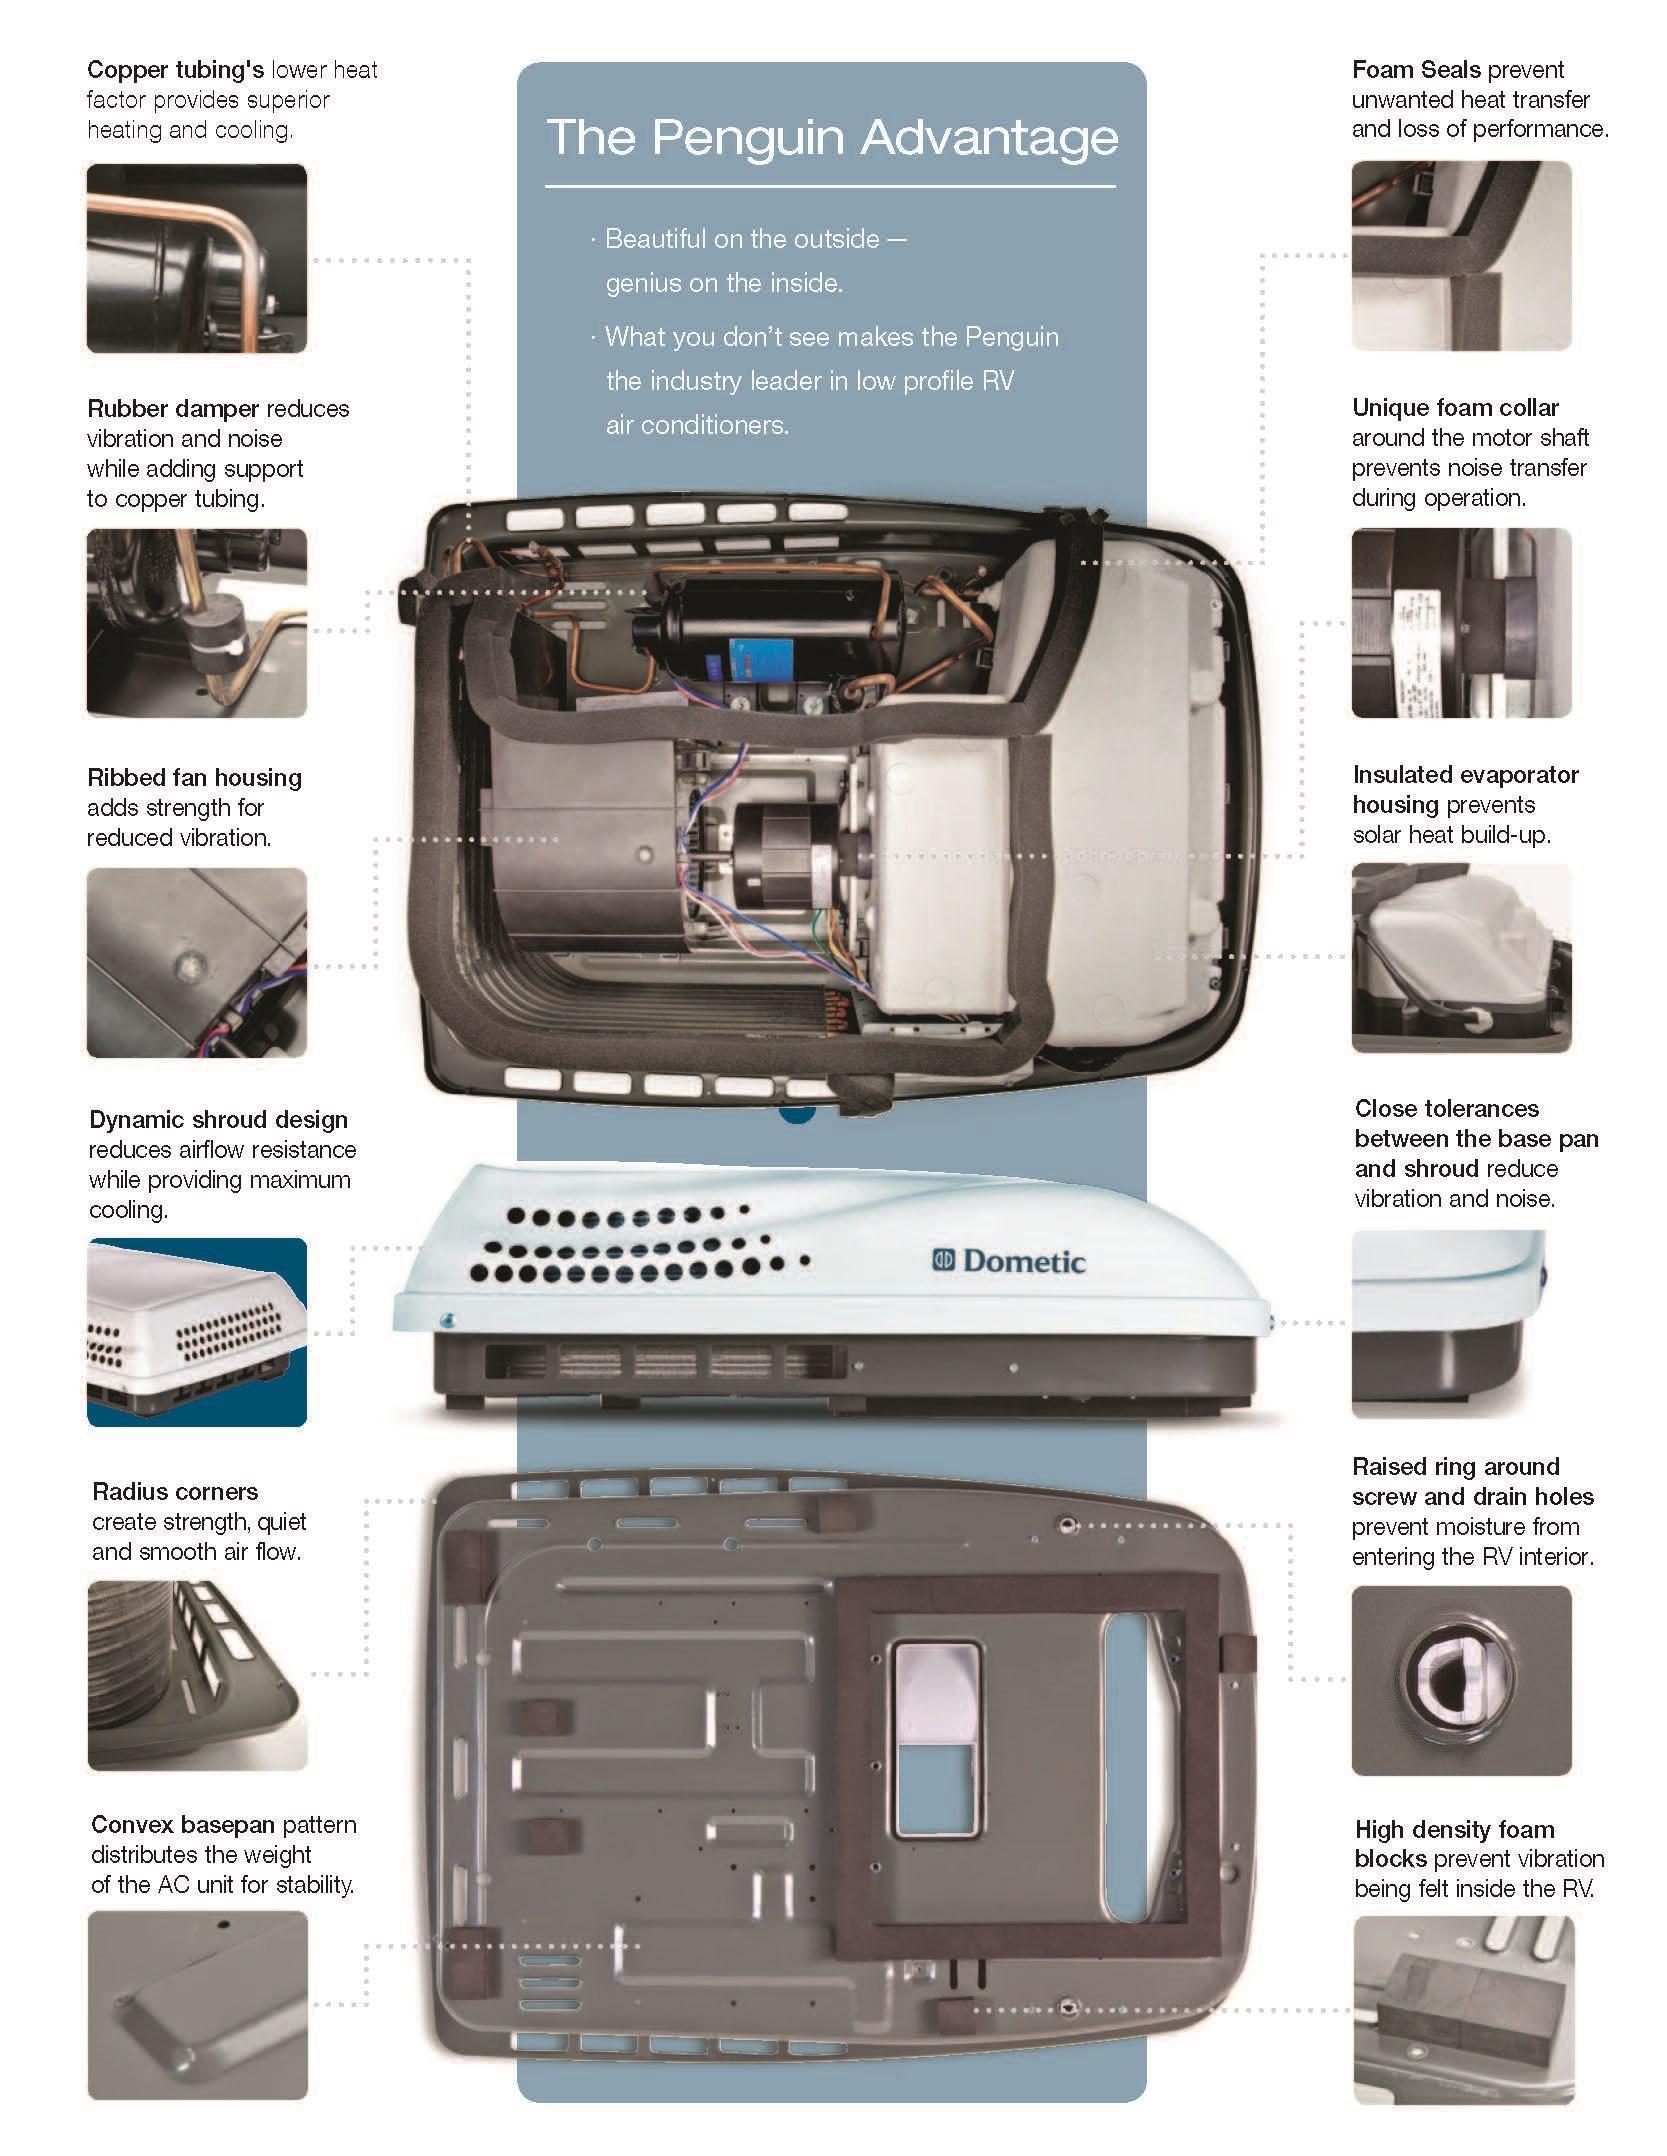 Wiring Diagram Rv Dometic 15000 Heat Pump from m.media-amazon.com